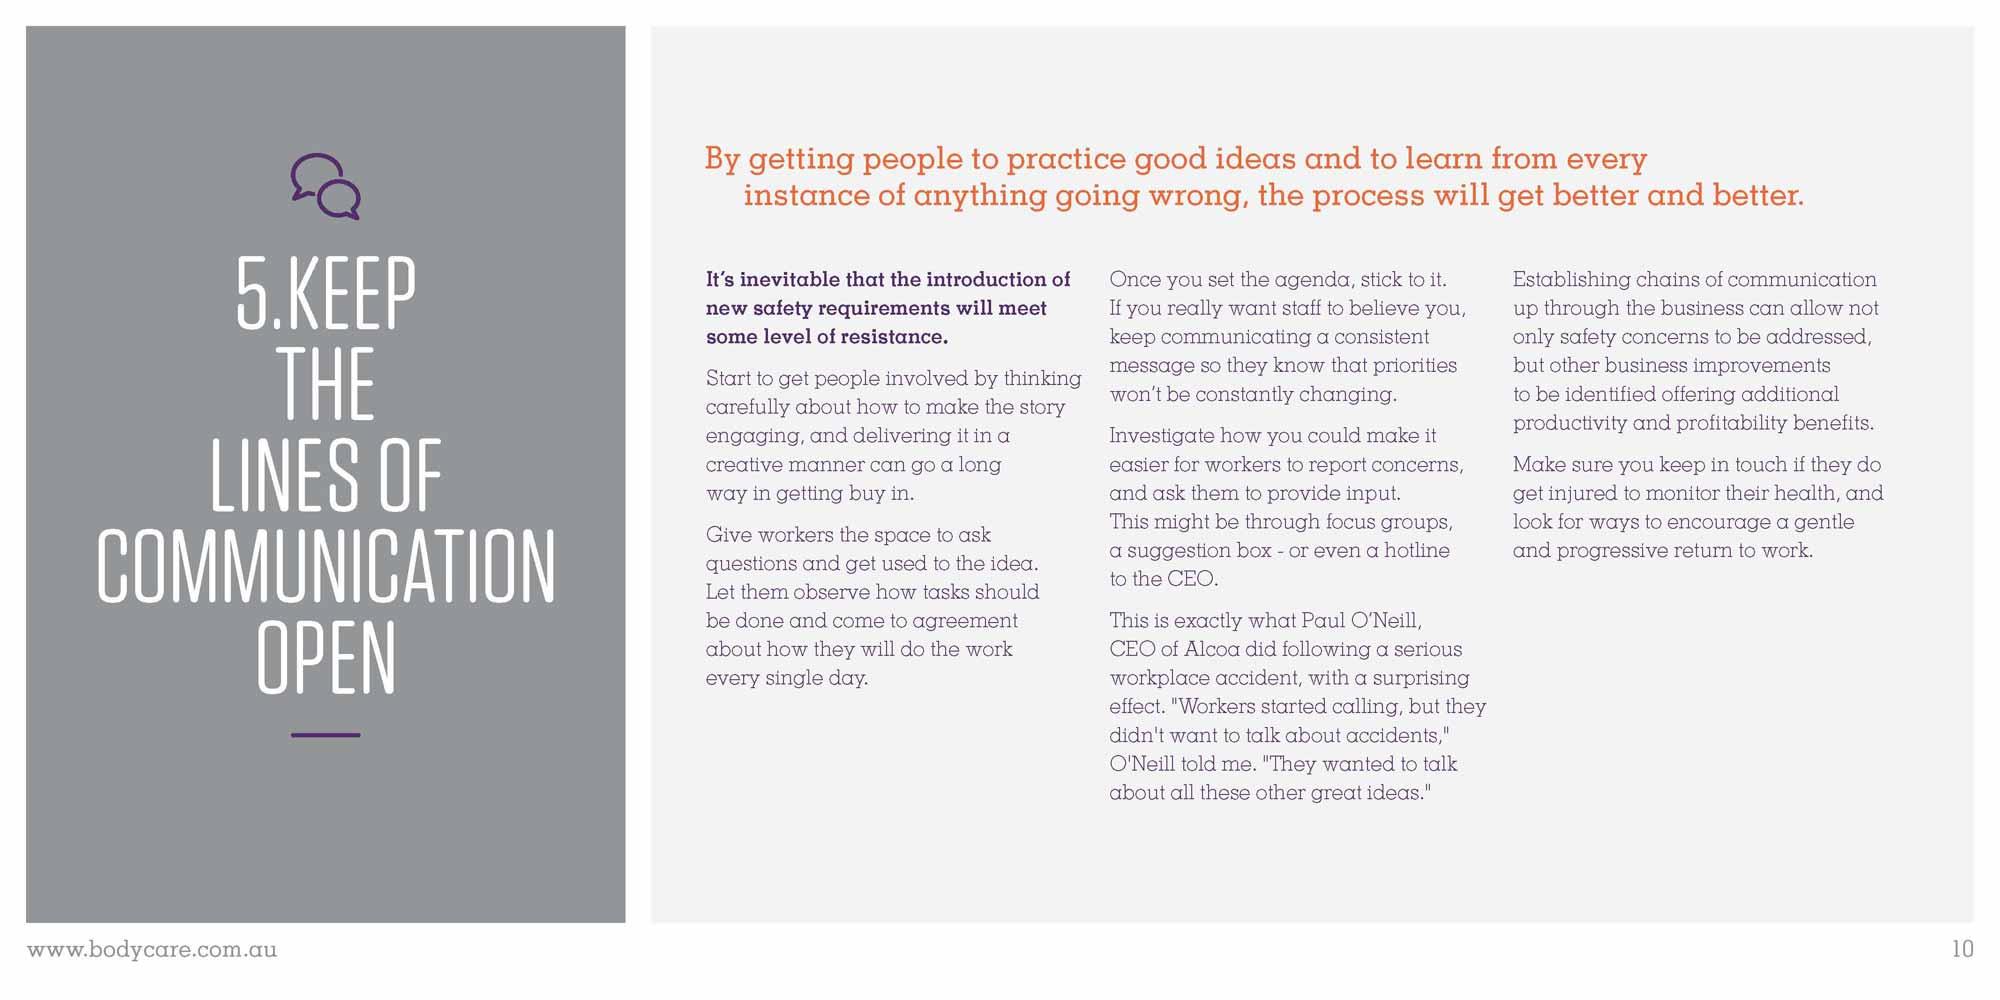 BodyCare-Injury-Prevention-Whitepaper-FA_Page_10.jpg